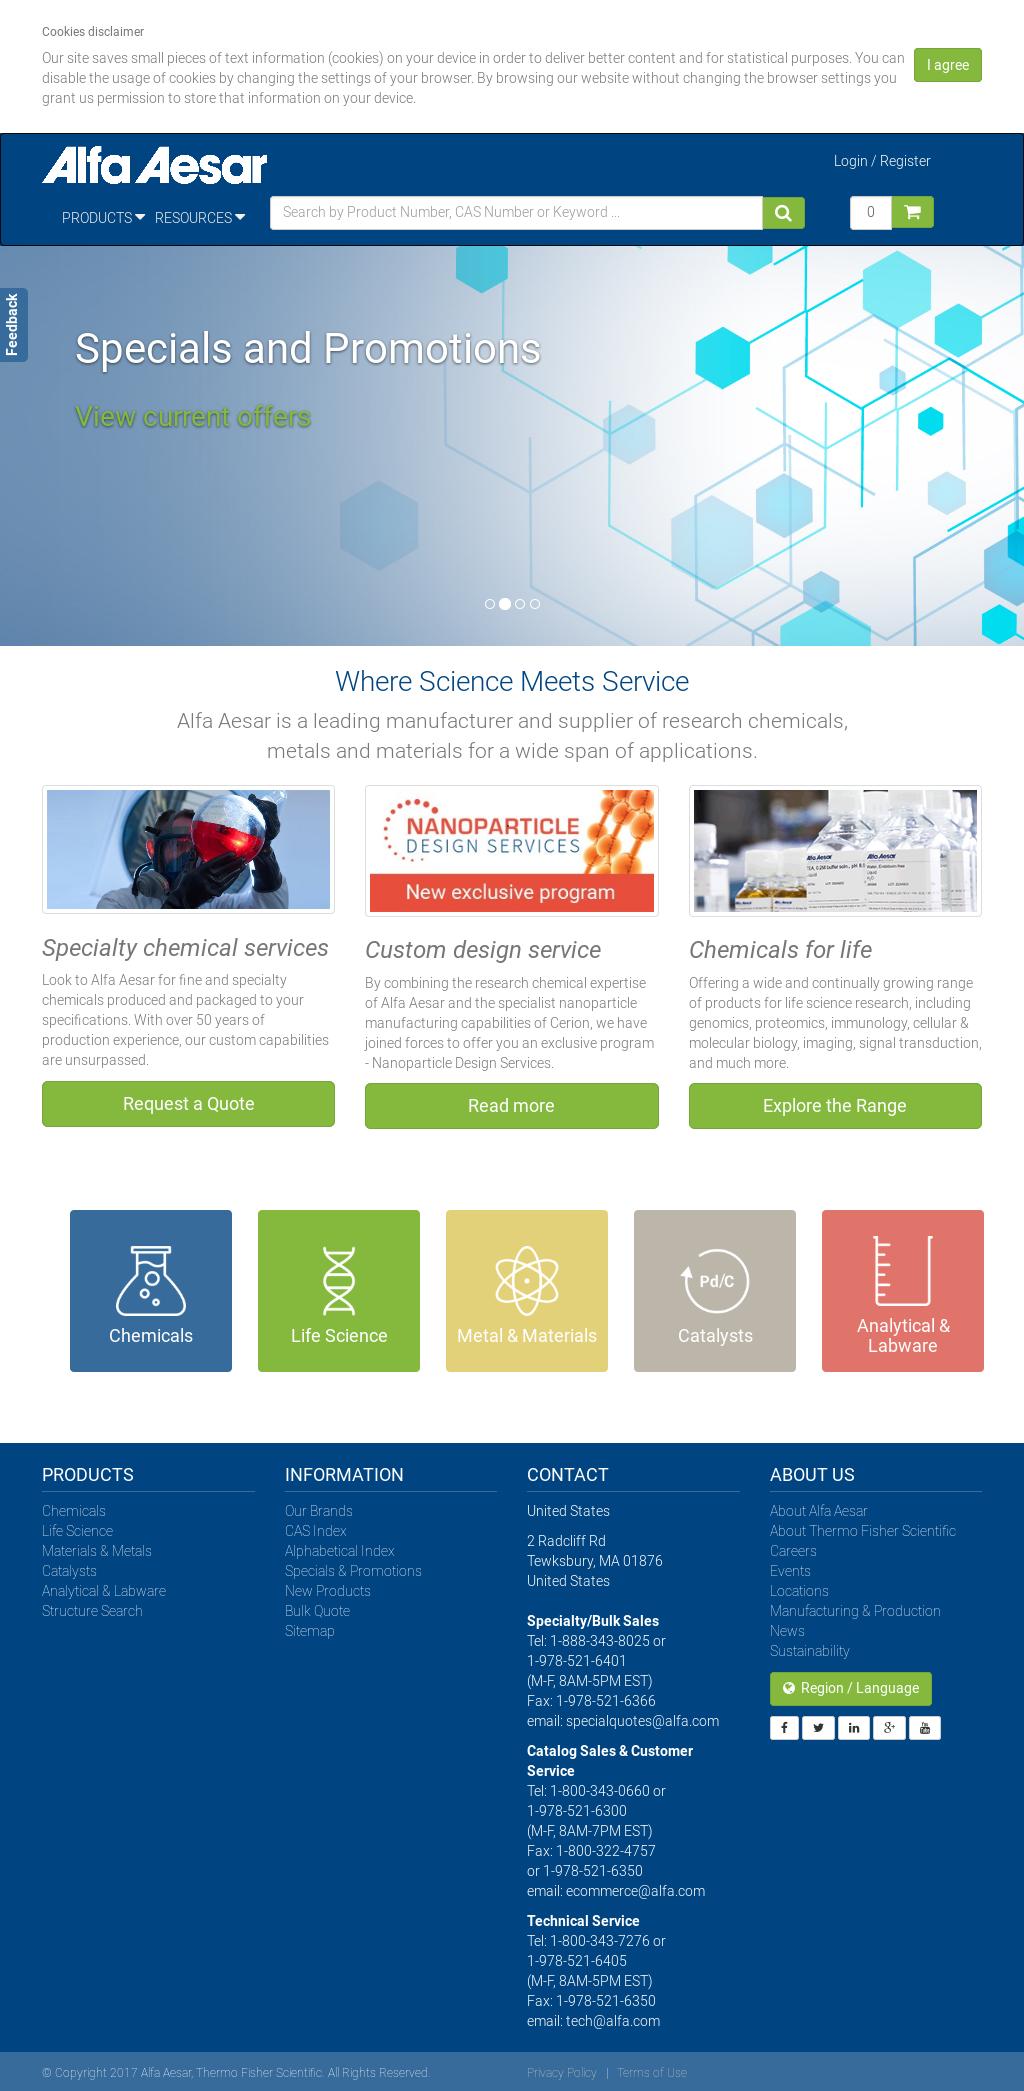 Alfa Aesar Competitors, Revenue and Employees - Owler Company Profile